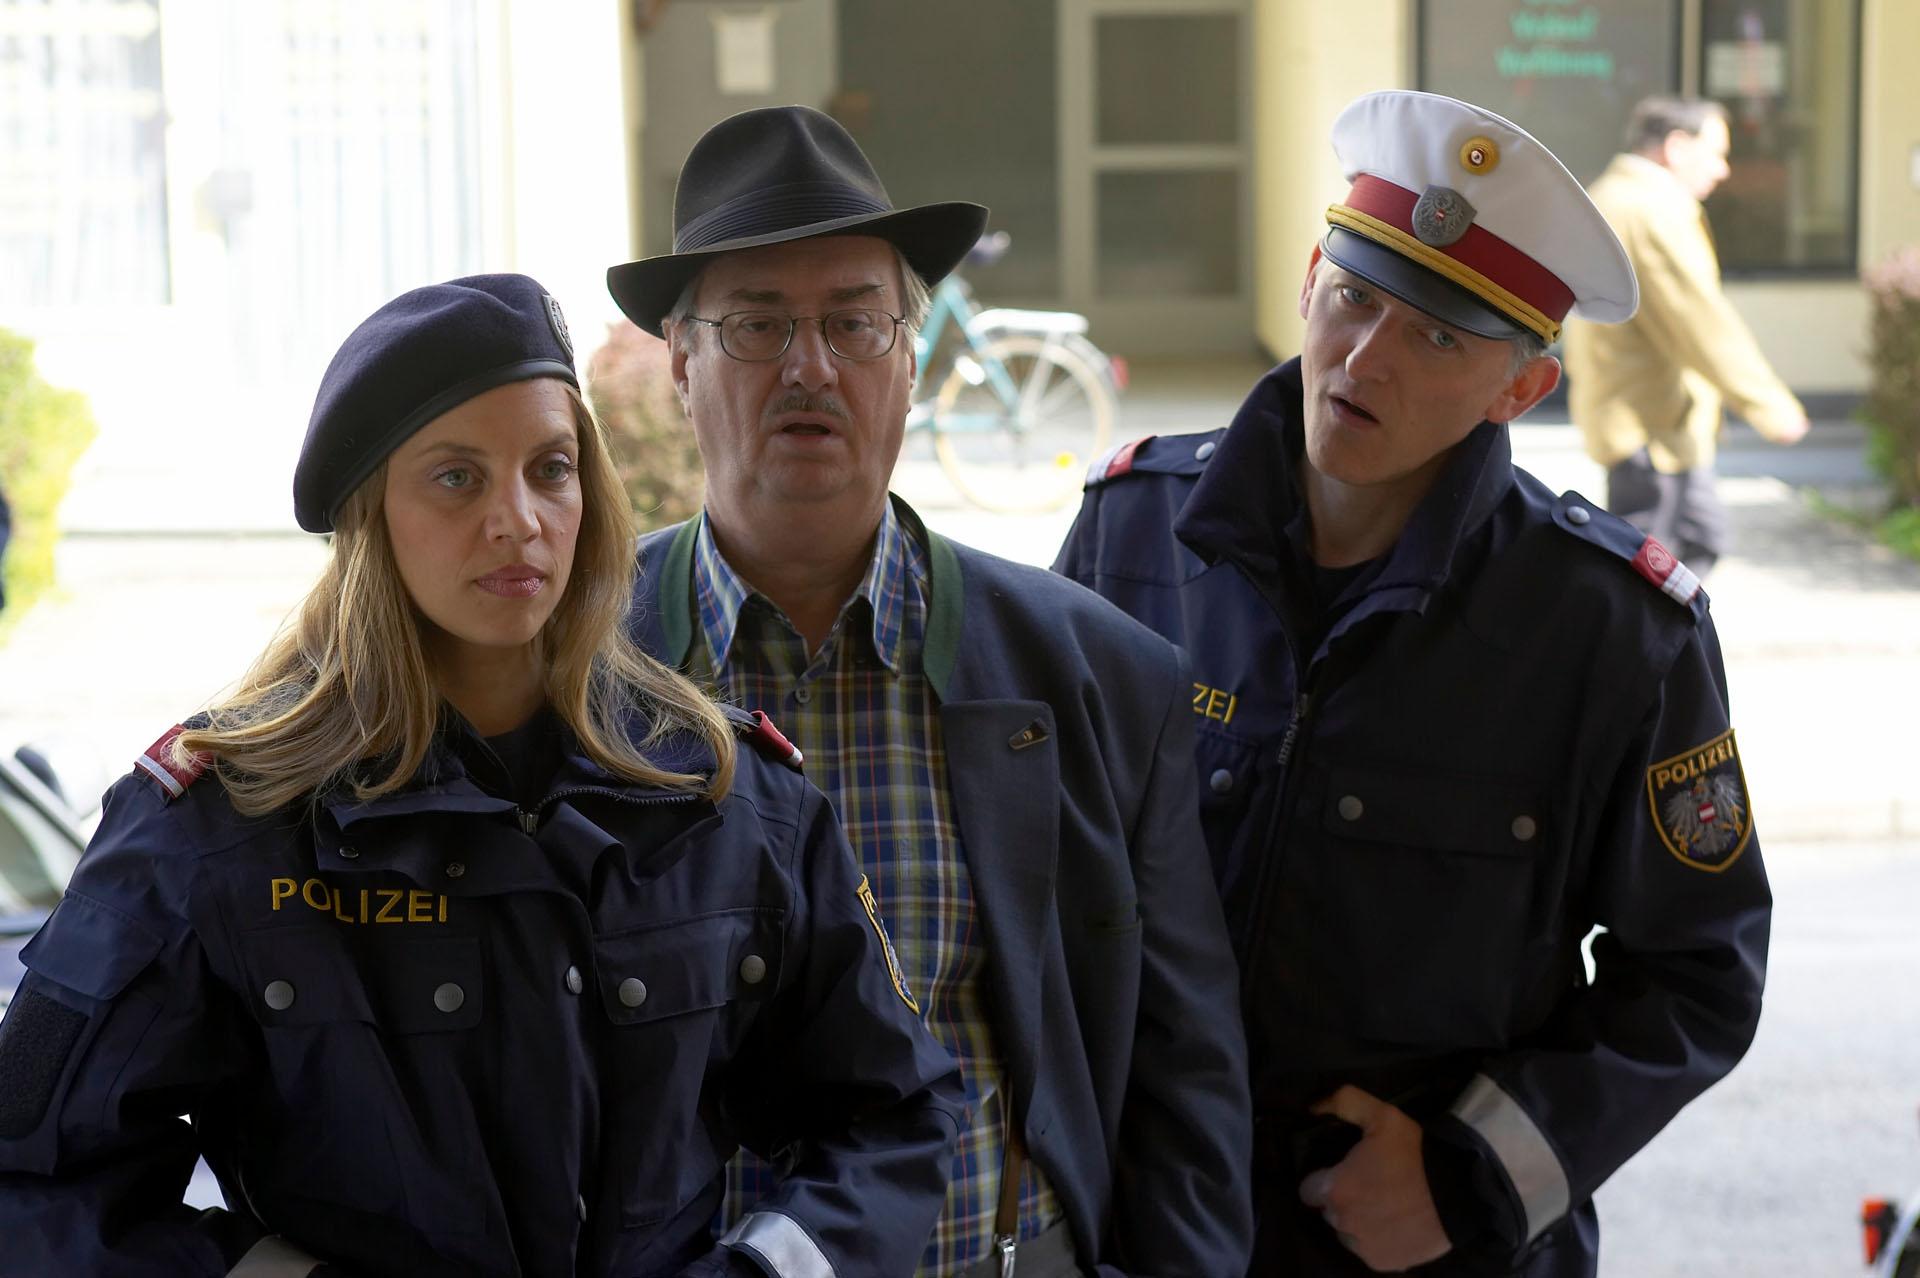 © Star*Film - Martina Schwab, Gerhard Zemann, Manfred Dungl